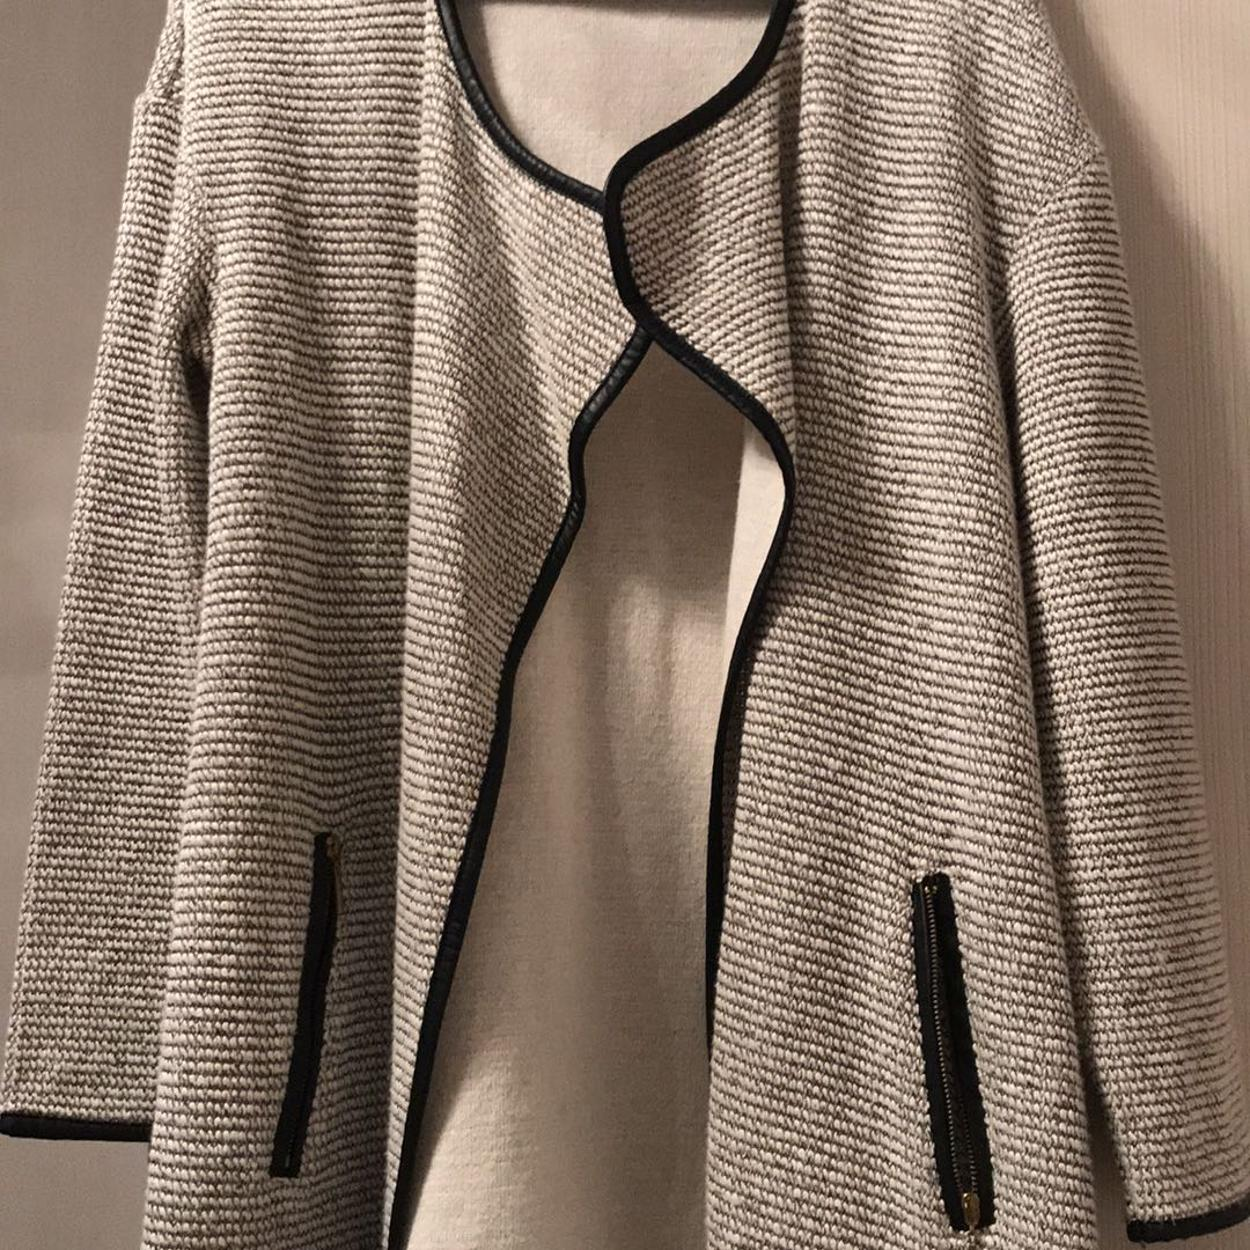 İpekyol Kaban/Palto